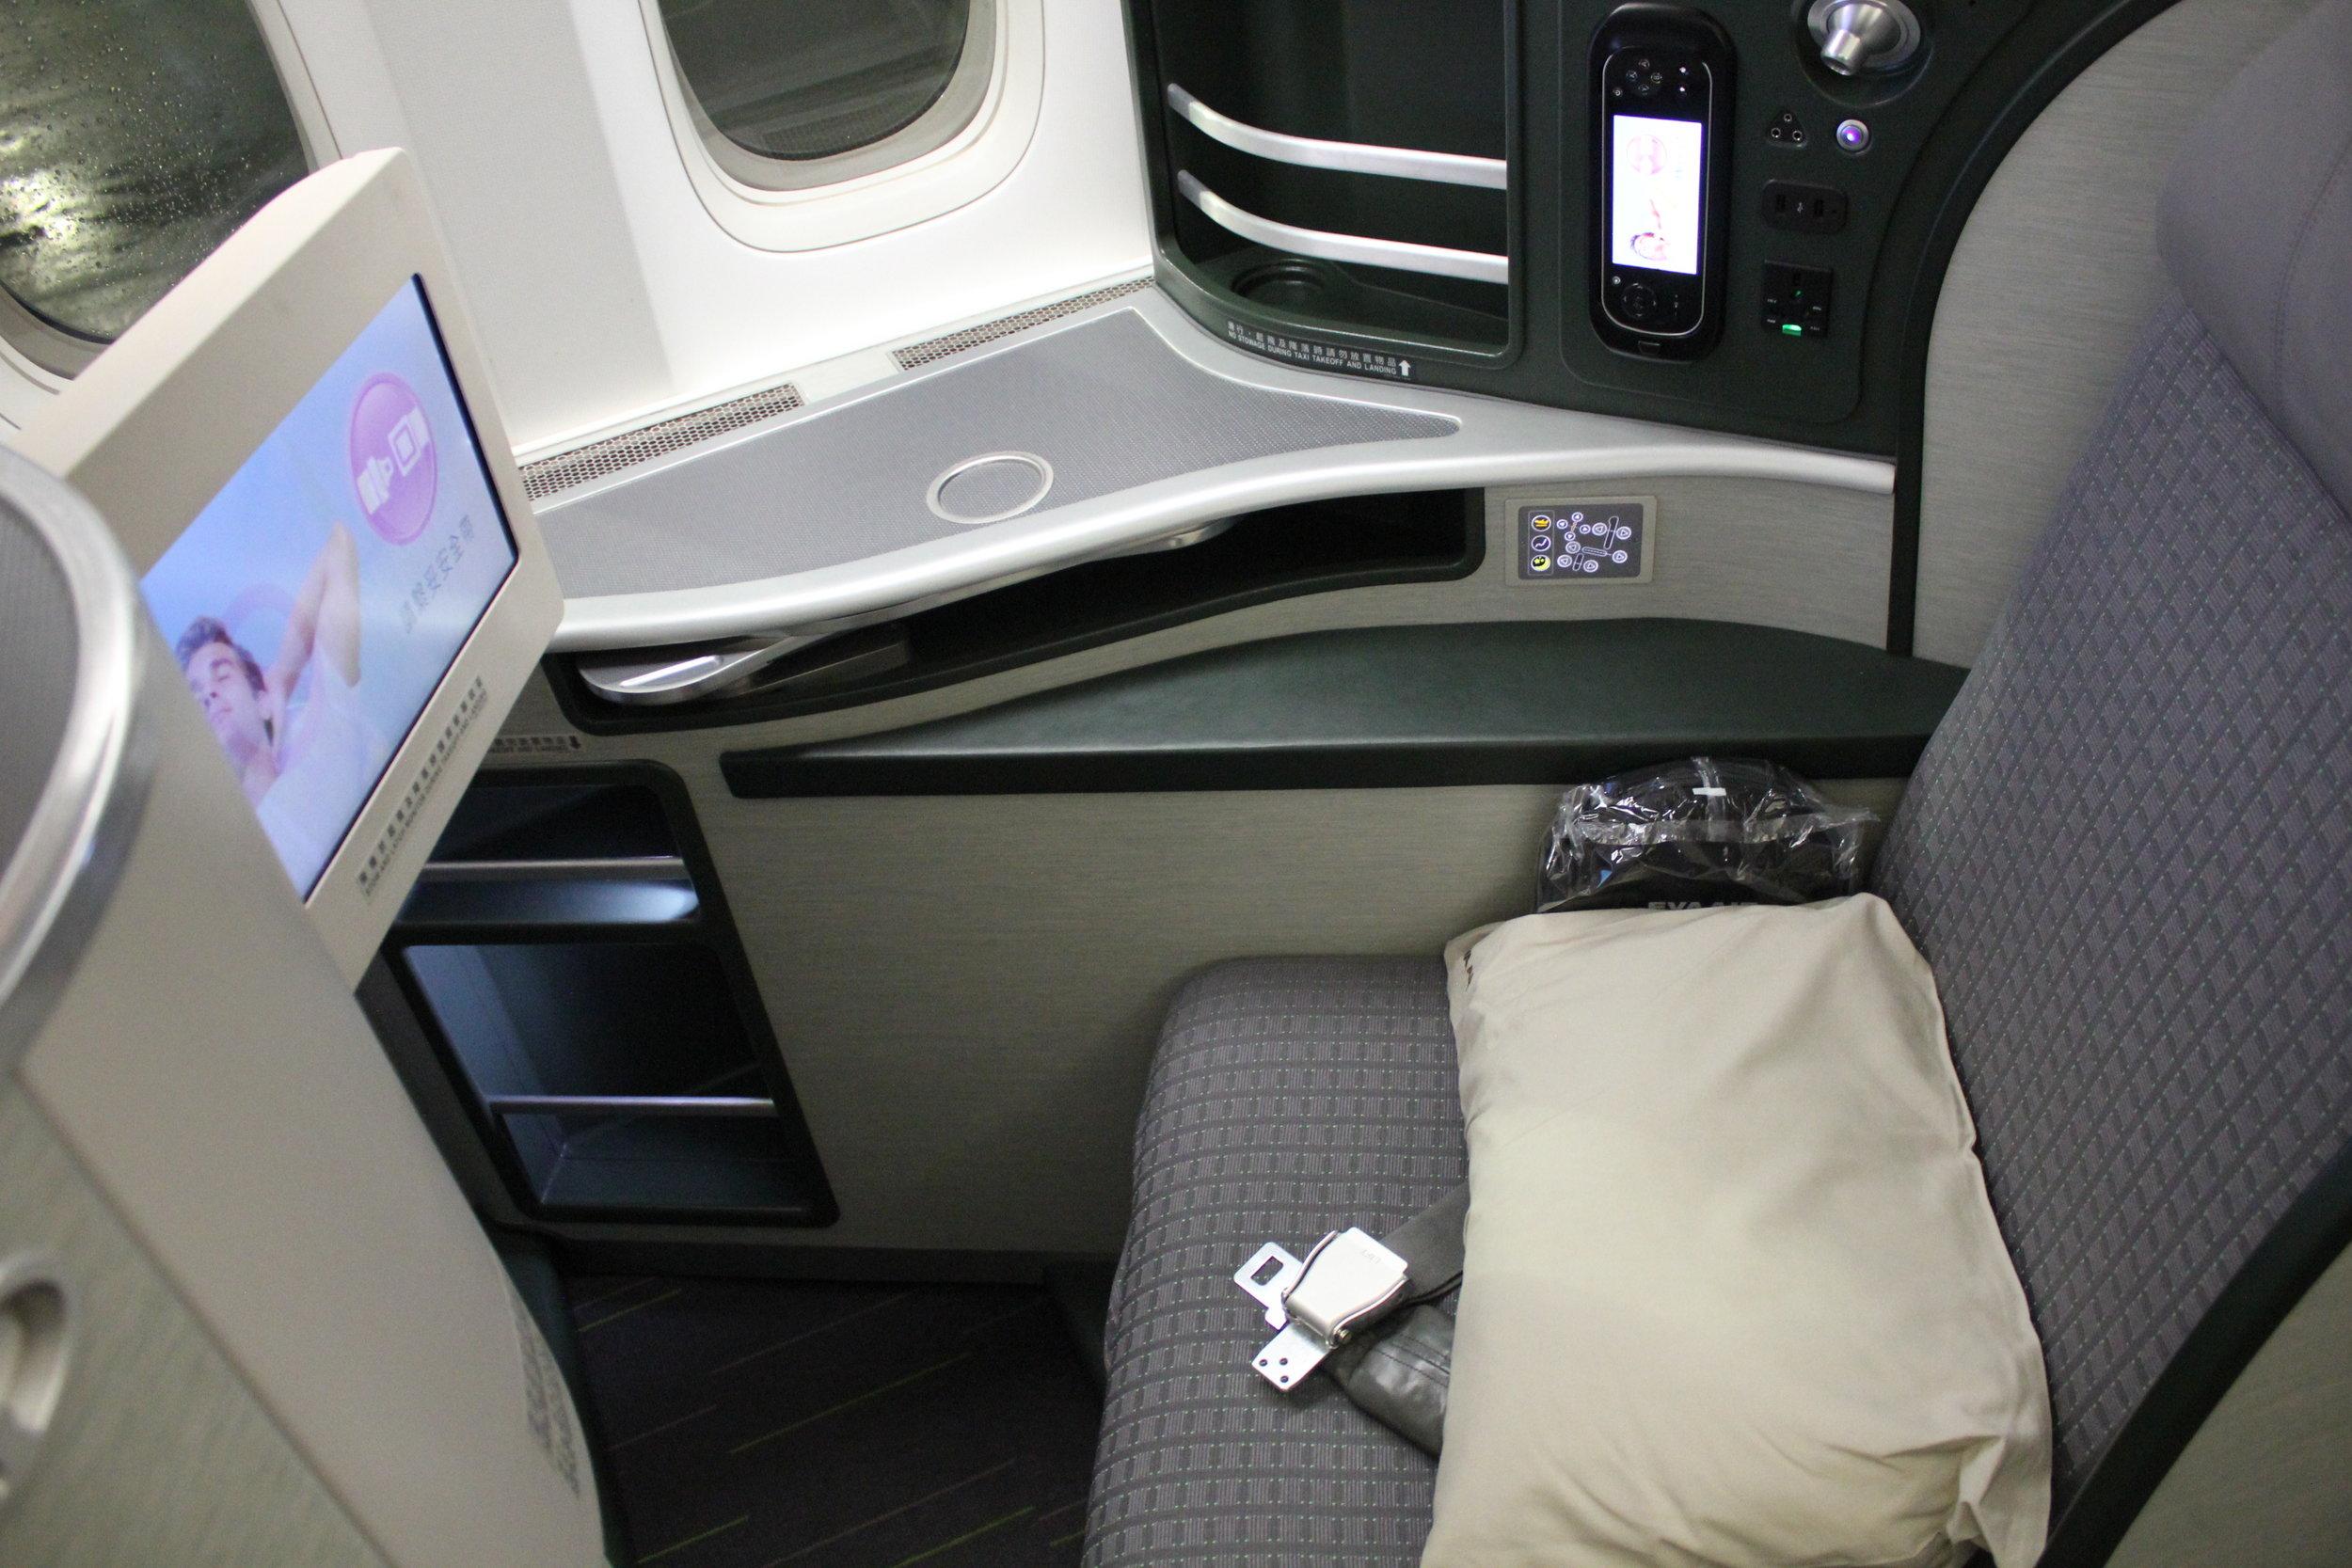 EVA Air business class – Seat 8K